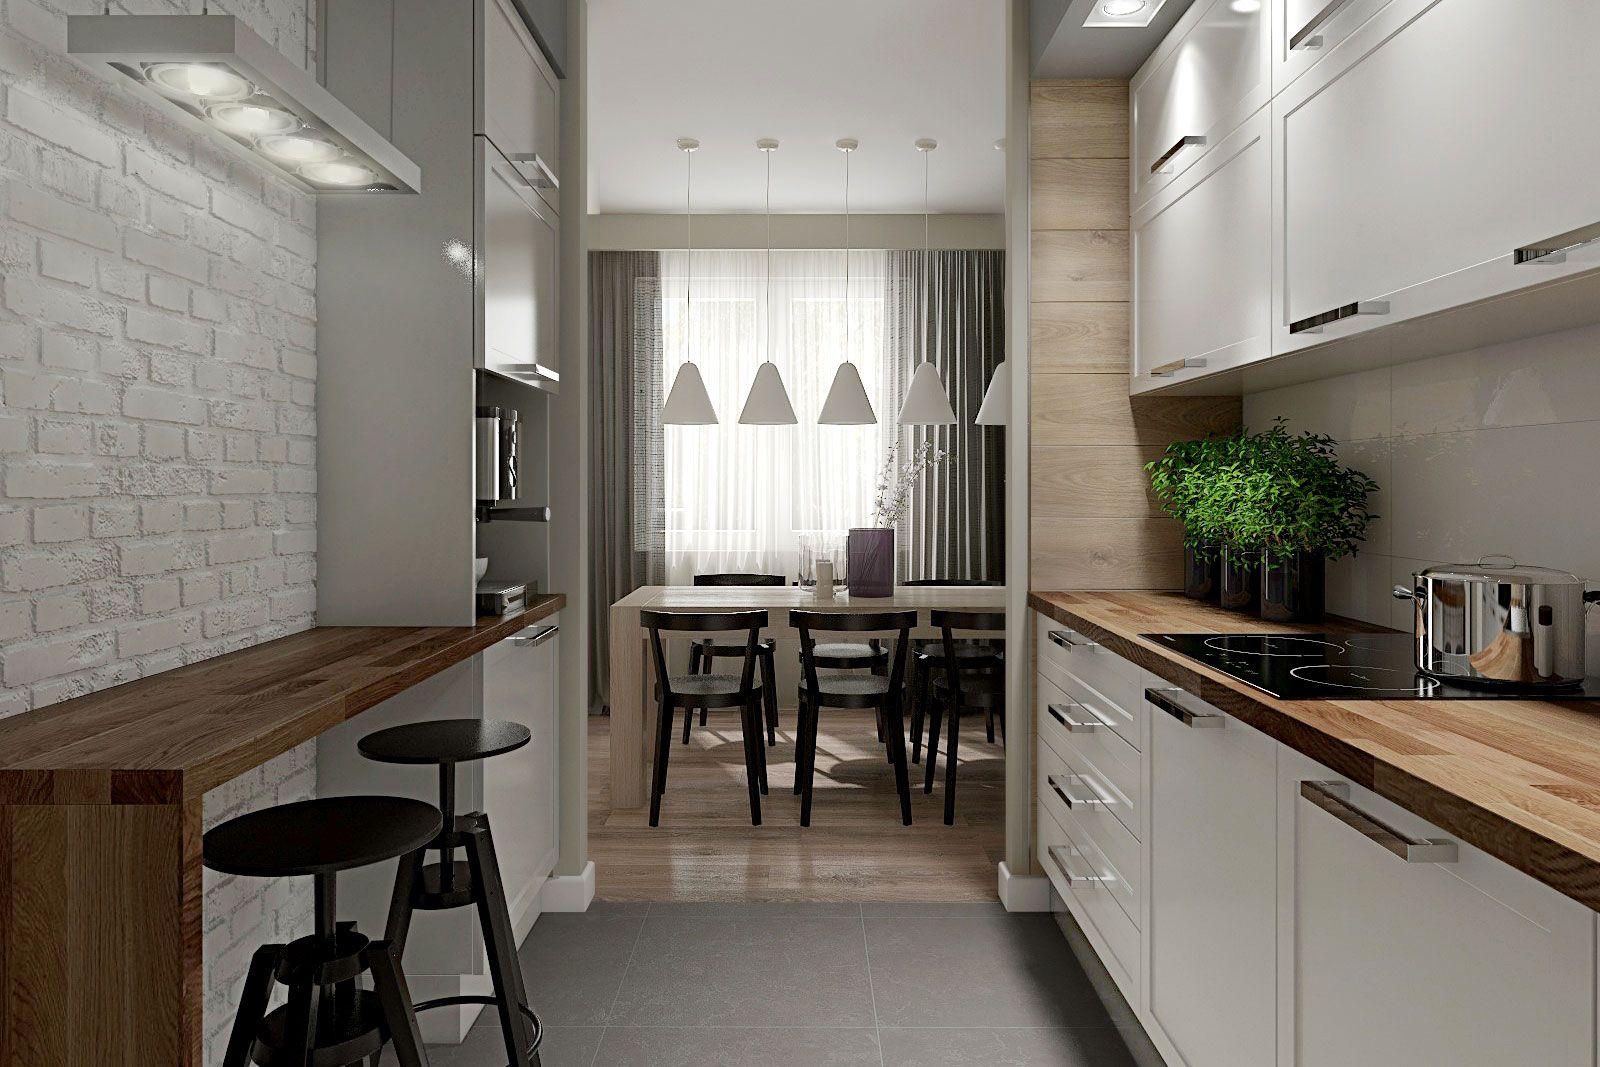 Aranzacja Projektowanie Wnetrz Pojektant Architekt Krakow Mikolajskastudio Krystyna Mikolajska Kitchen Interior Kitchen Design Kitchen Redesign